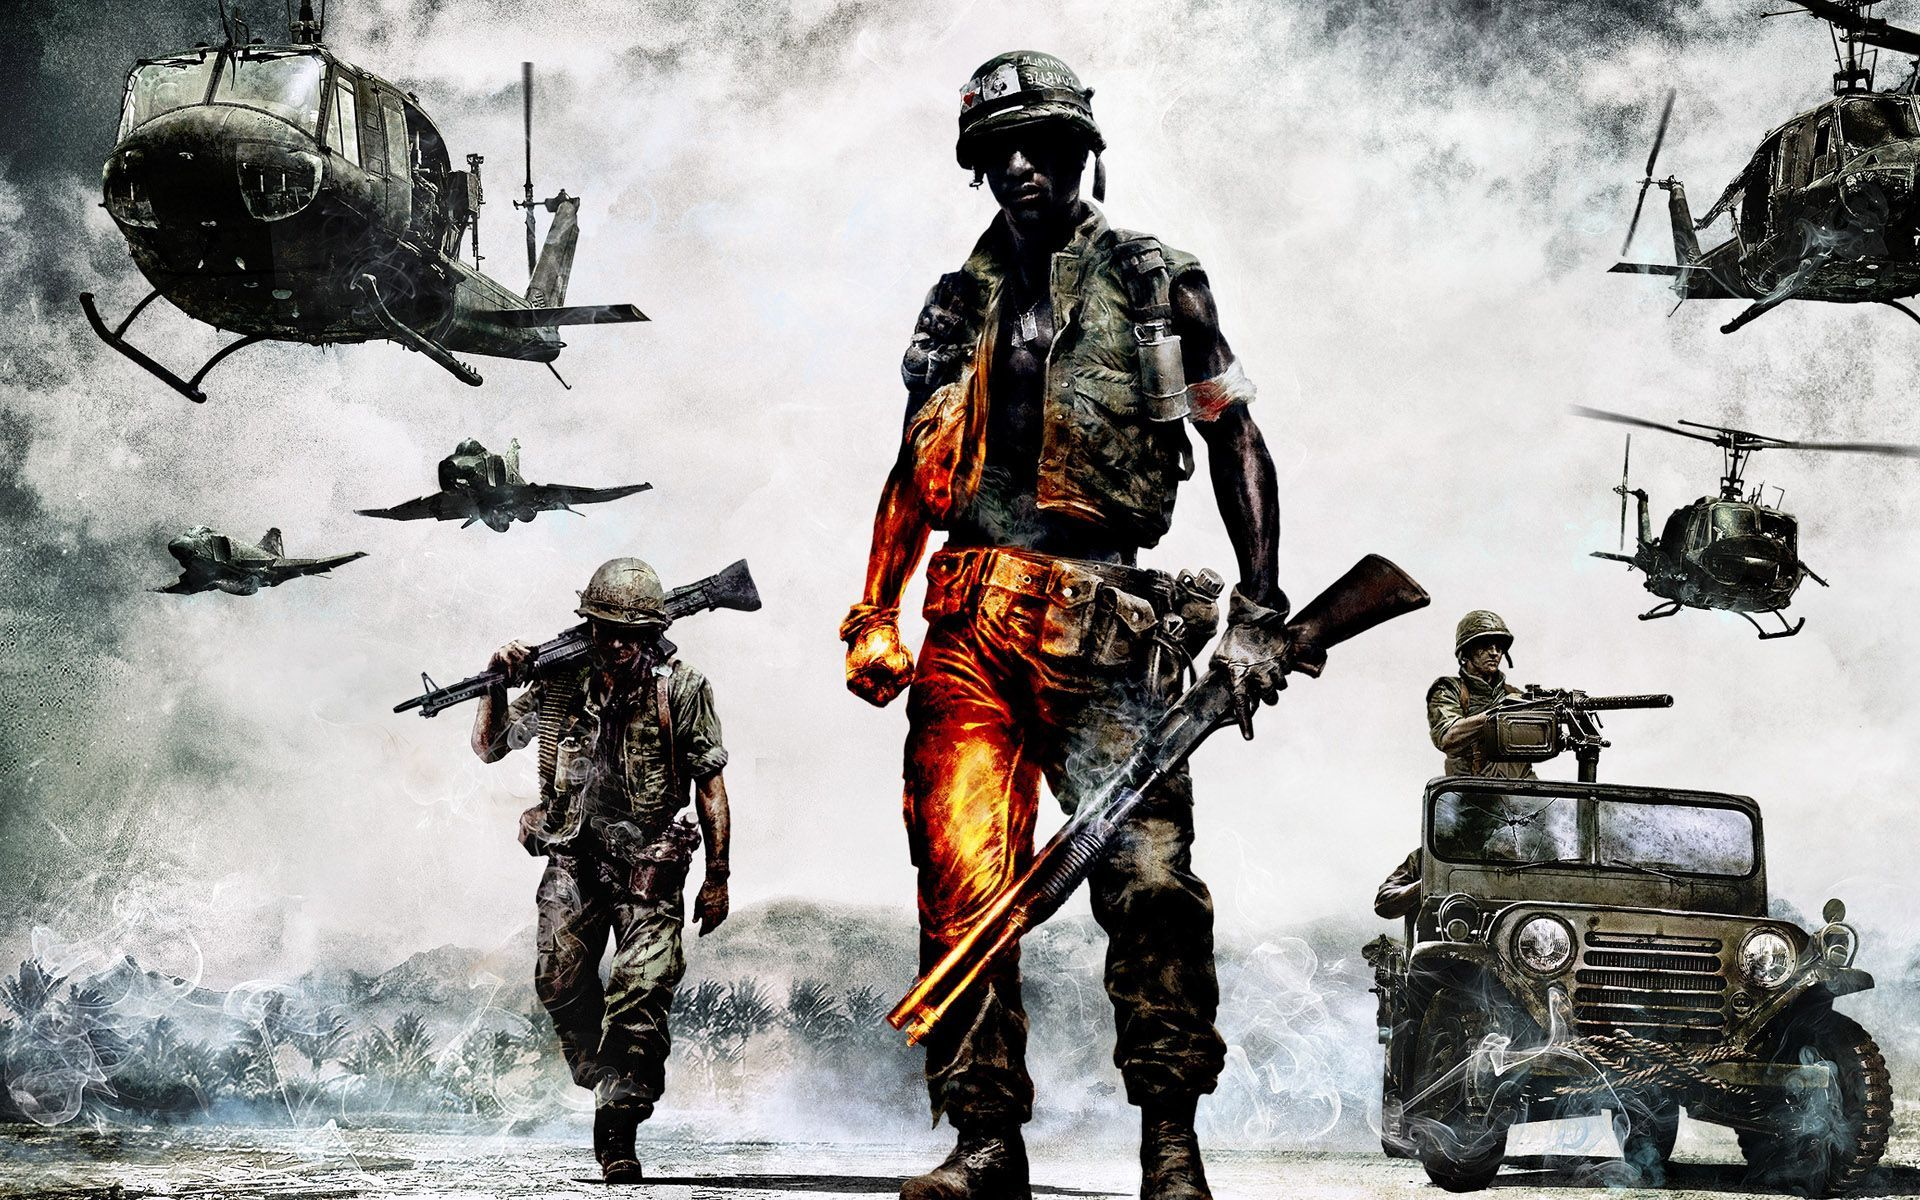 Battlefield   Bad Company 2 wallpaper 13931 1920x1200